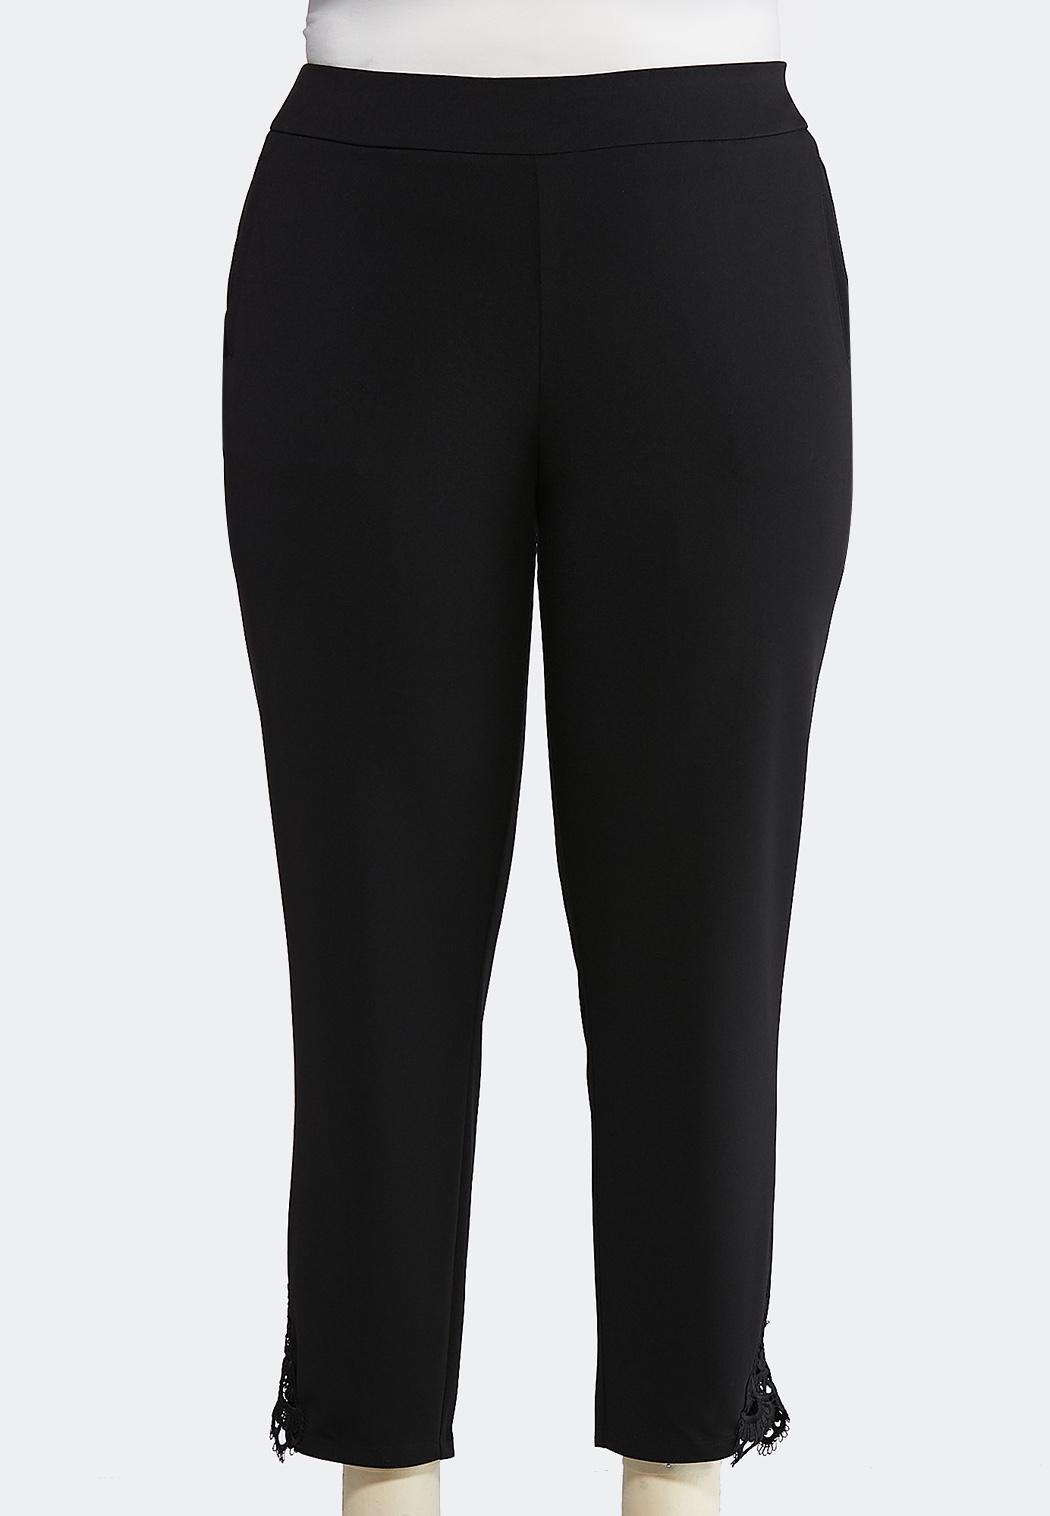 6bd1b1f0f4 Plus Size Slim Crochet Hem Pants Pants Cato Fashions